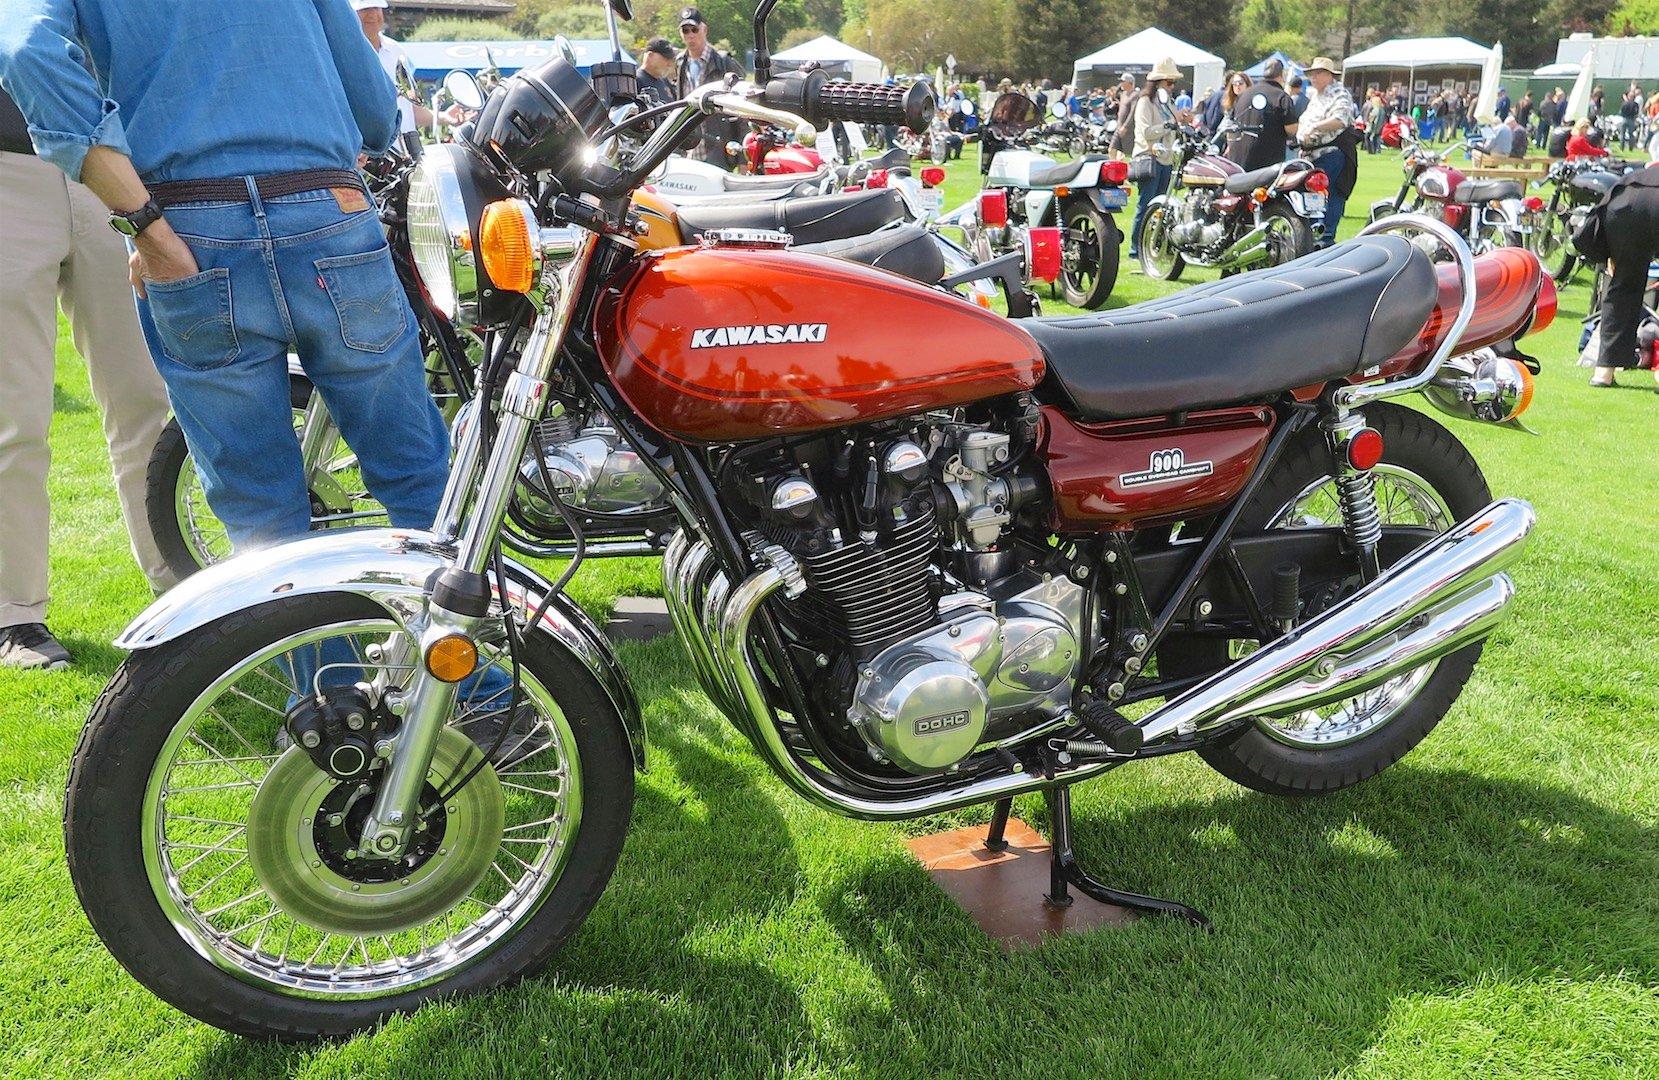 Riding the Kawasaki Z900RS to the Quail Z1